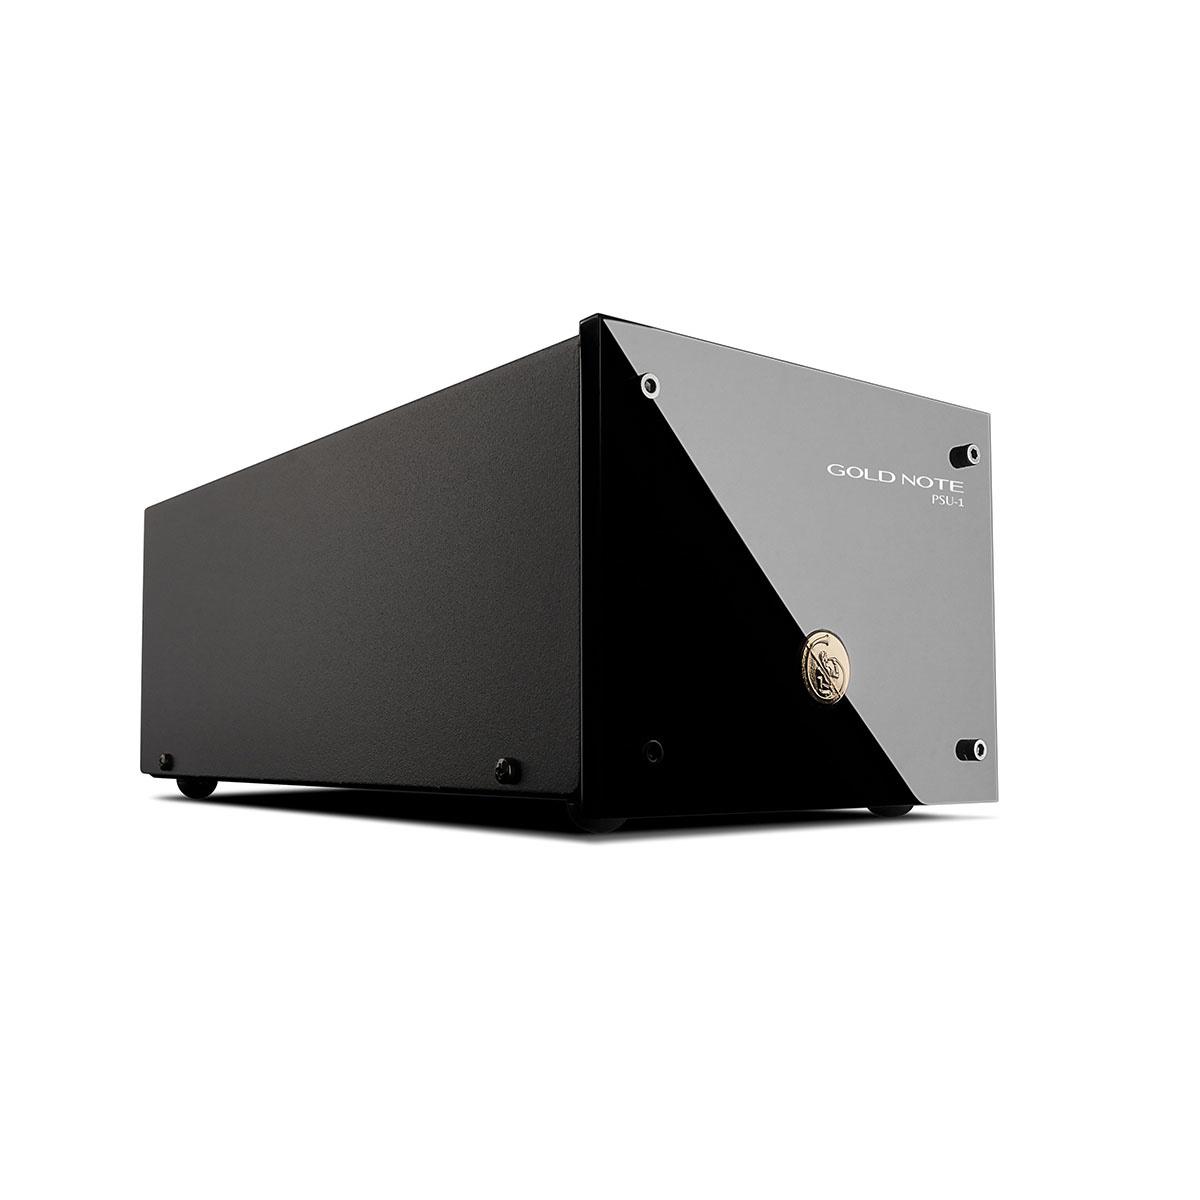 Gold Note PSU-1 Power Supply